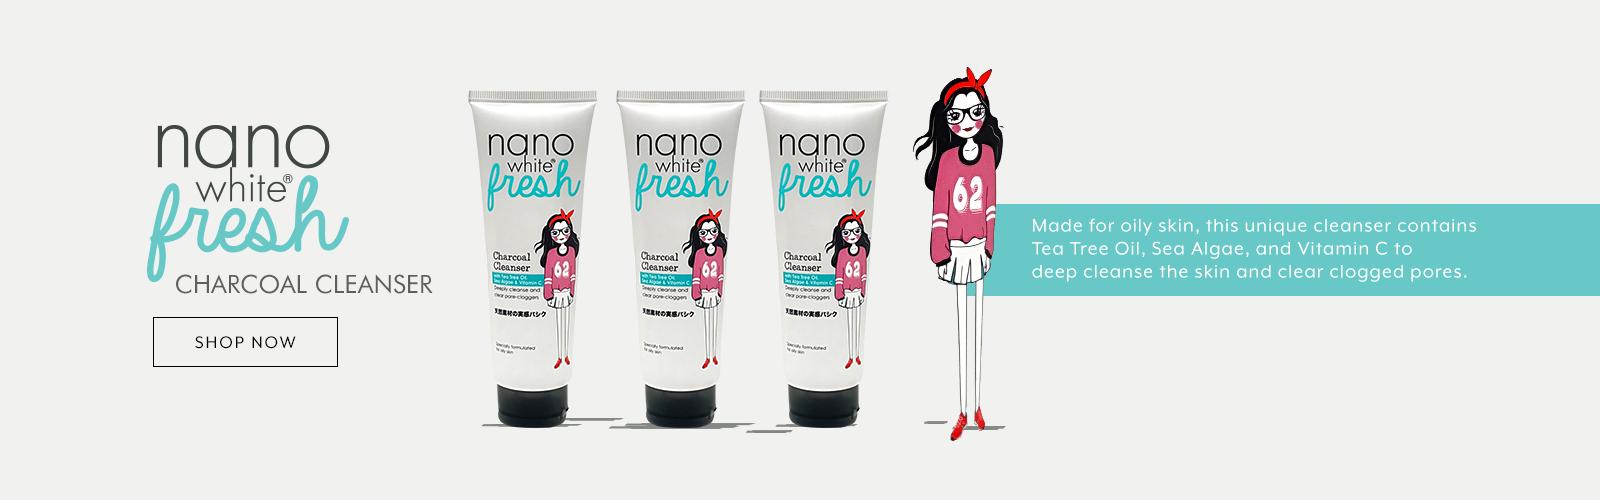 Nanowhite Fresh Charcoal Cleanser